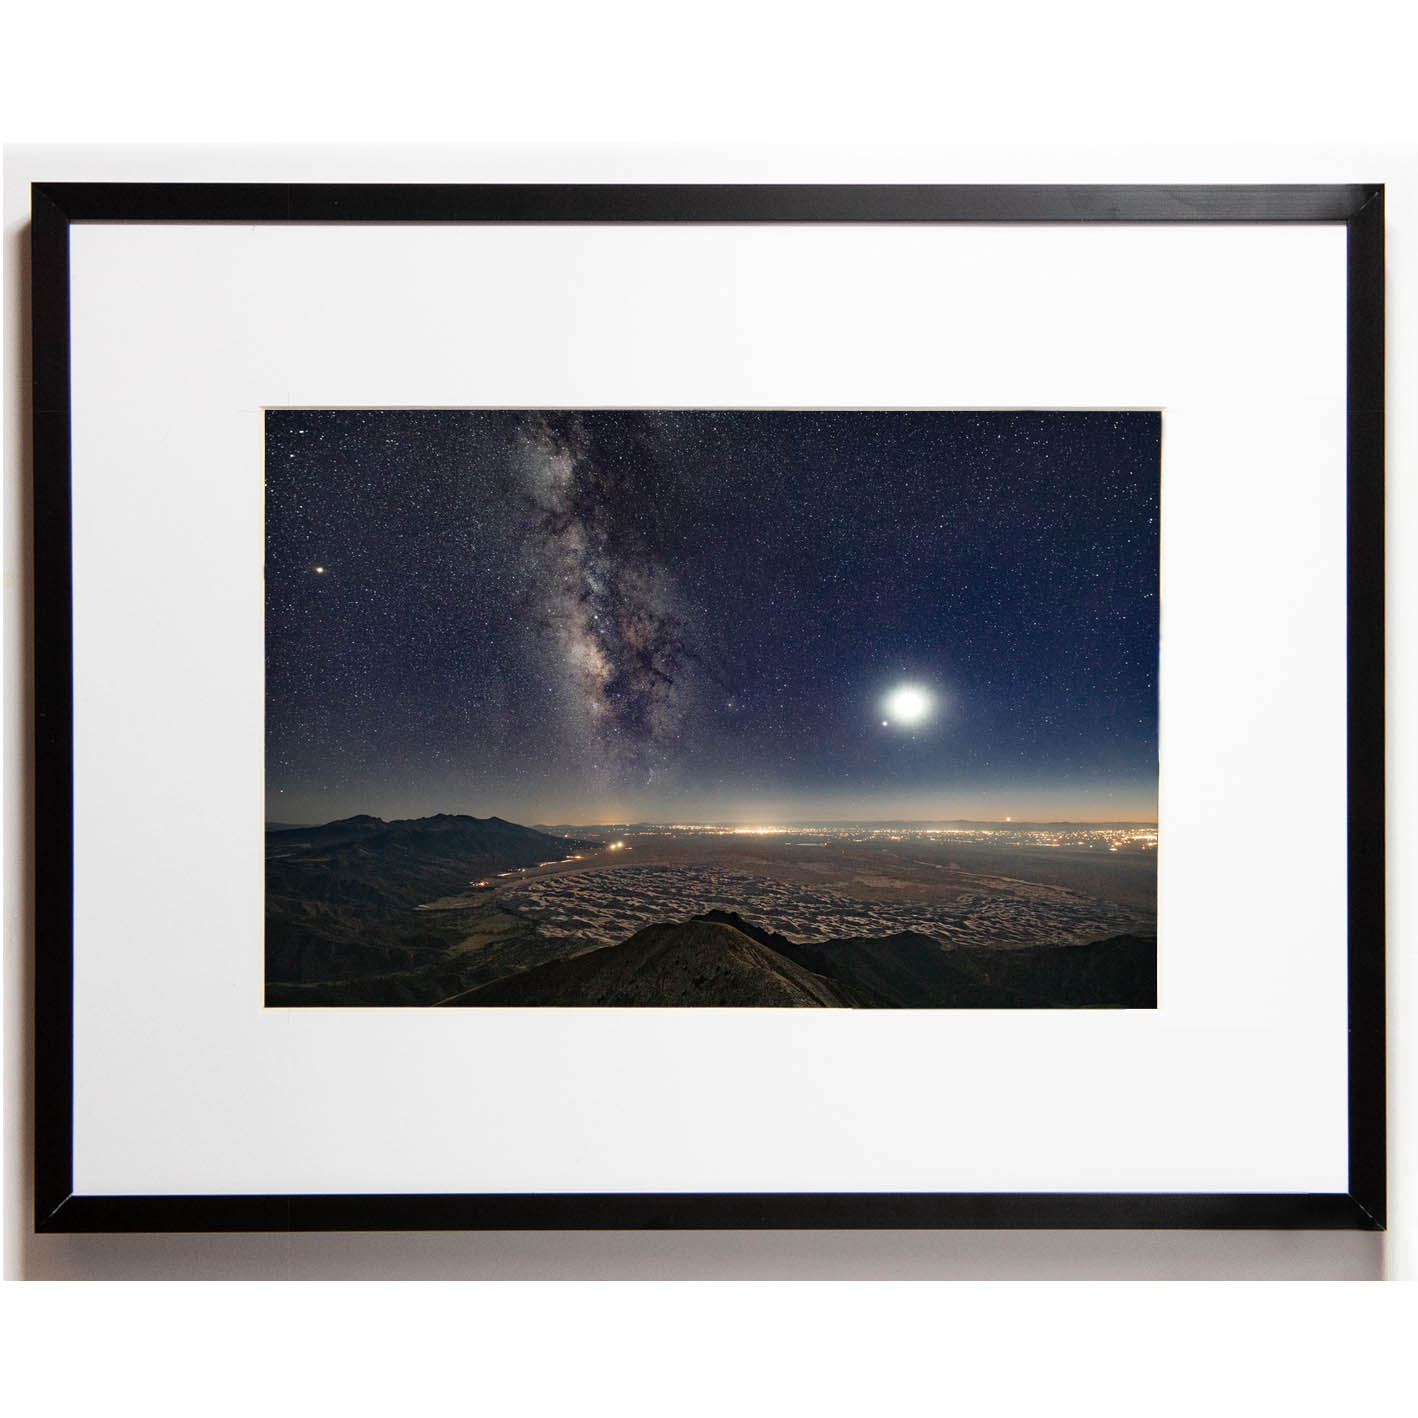 Cullis 8x12 framed - Sand Dunes cropped